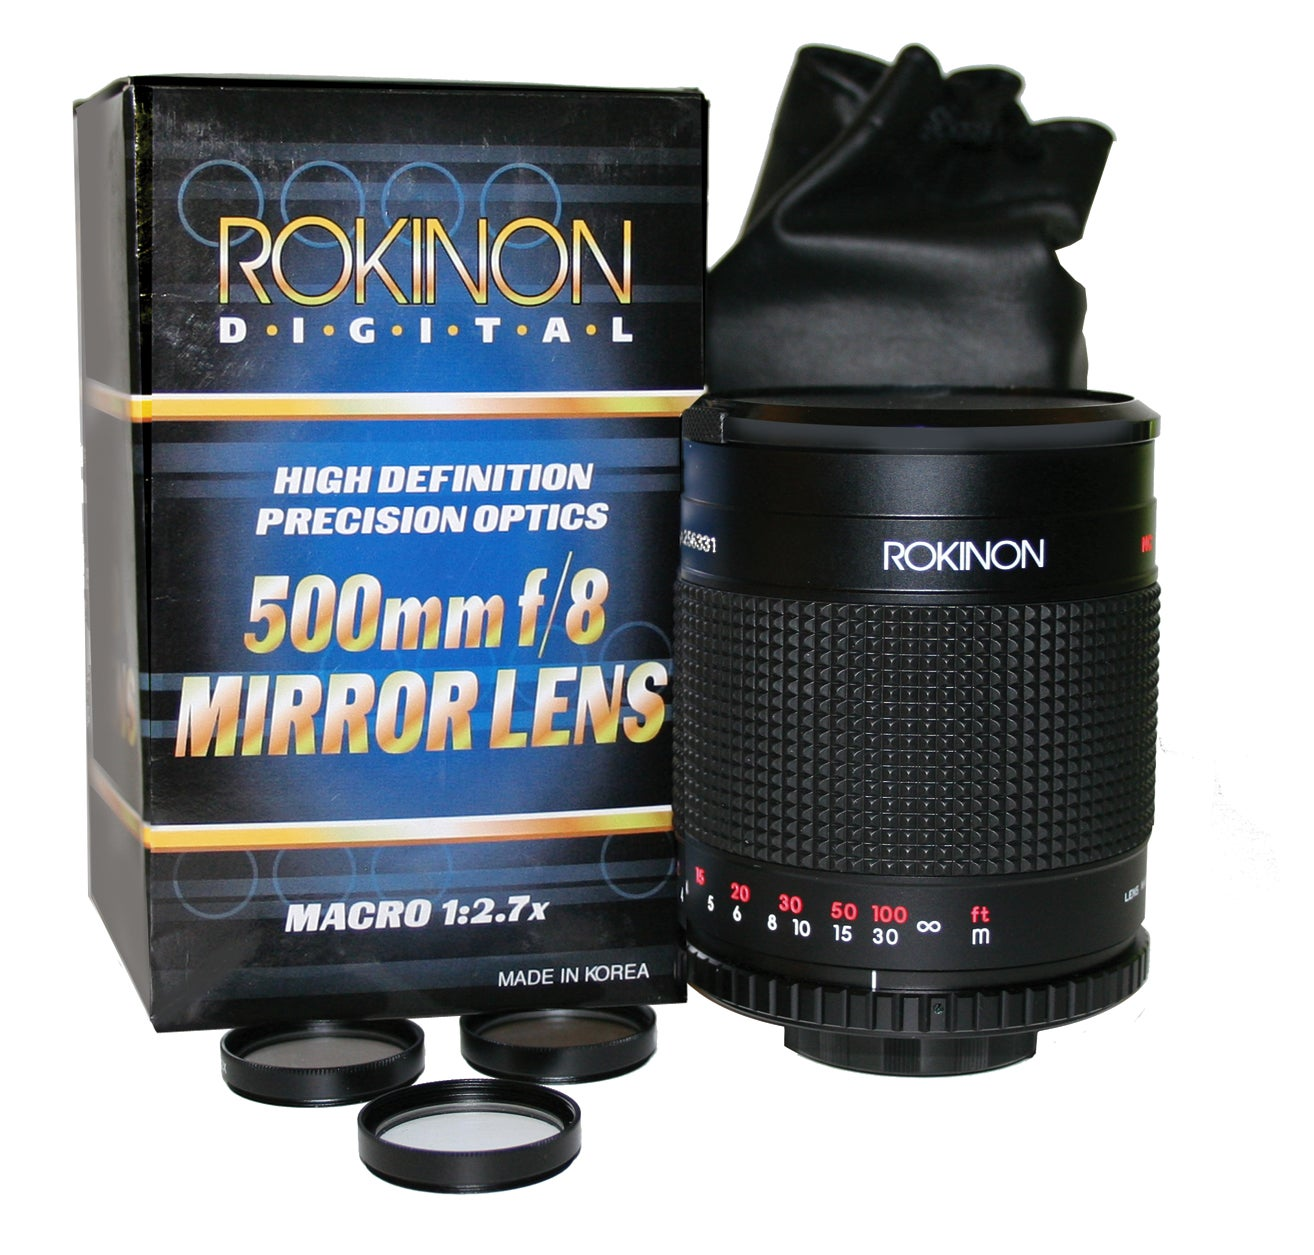 Rokinon 500mm/ 1000mm Mirror Lens for Canon EOS - Thumbnail 1